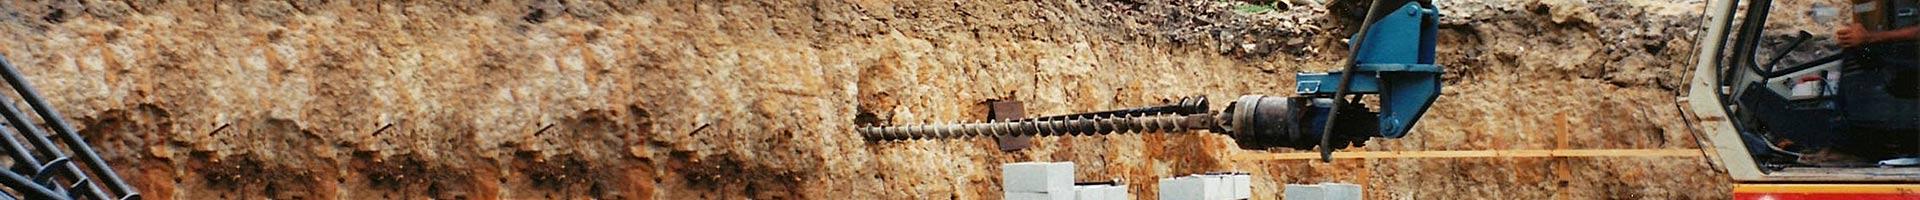 ground anchoring drill header